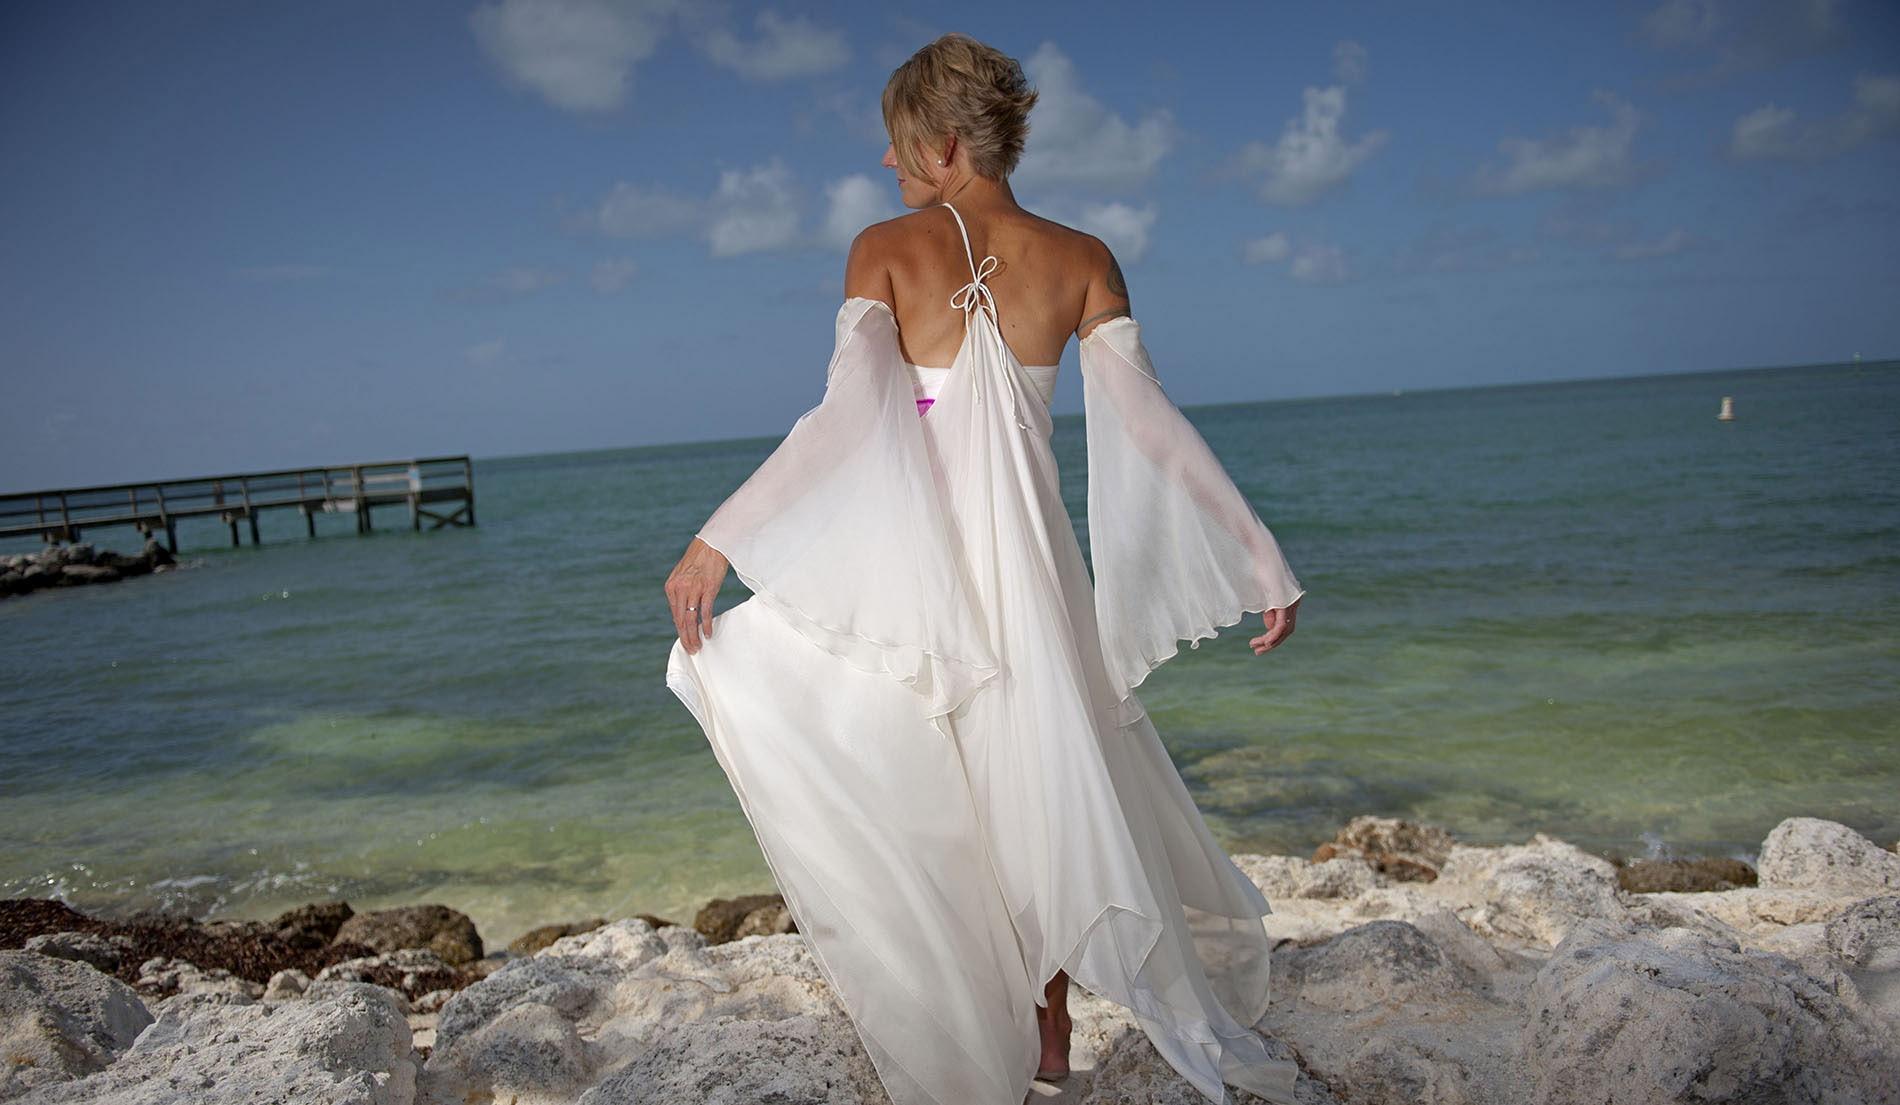 simple wedding dresses for second weddings second wedding dresses Second Marriage Casual Wedding Dresses